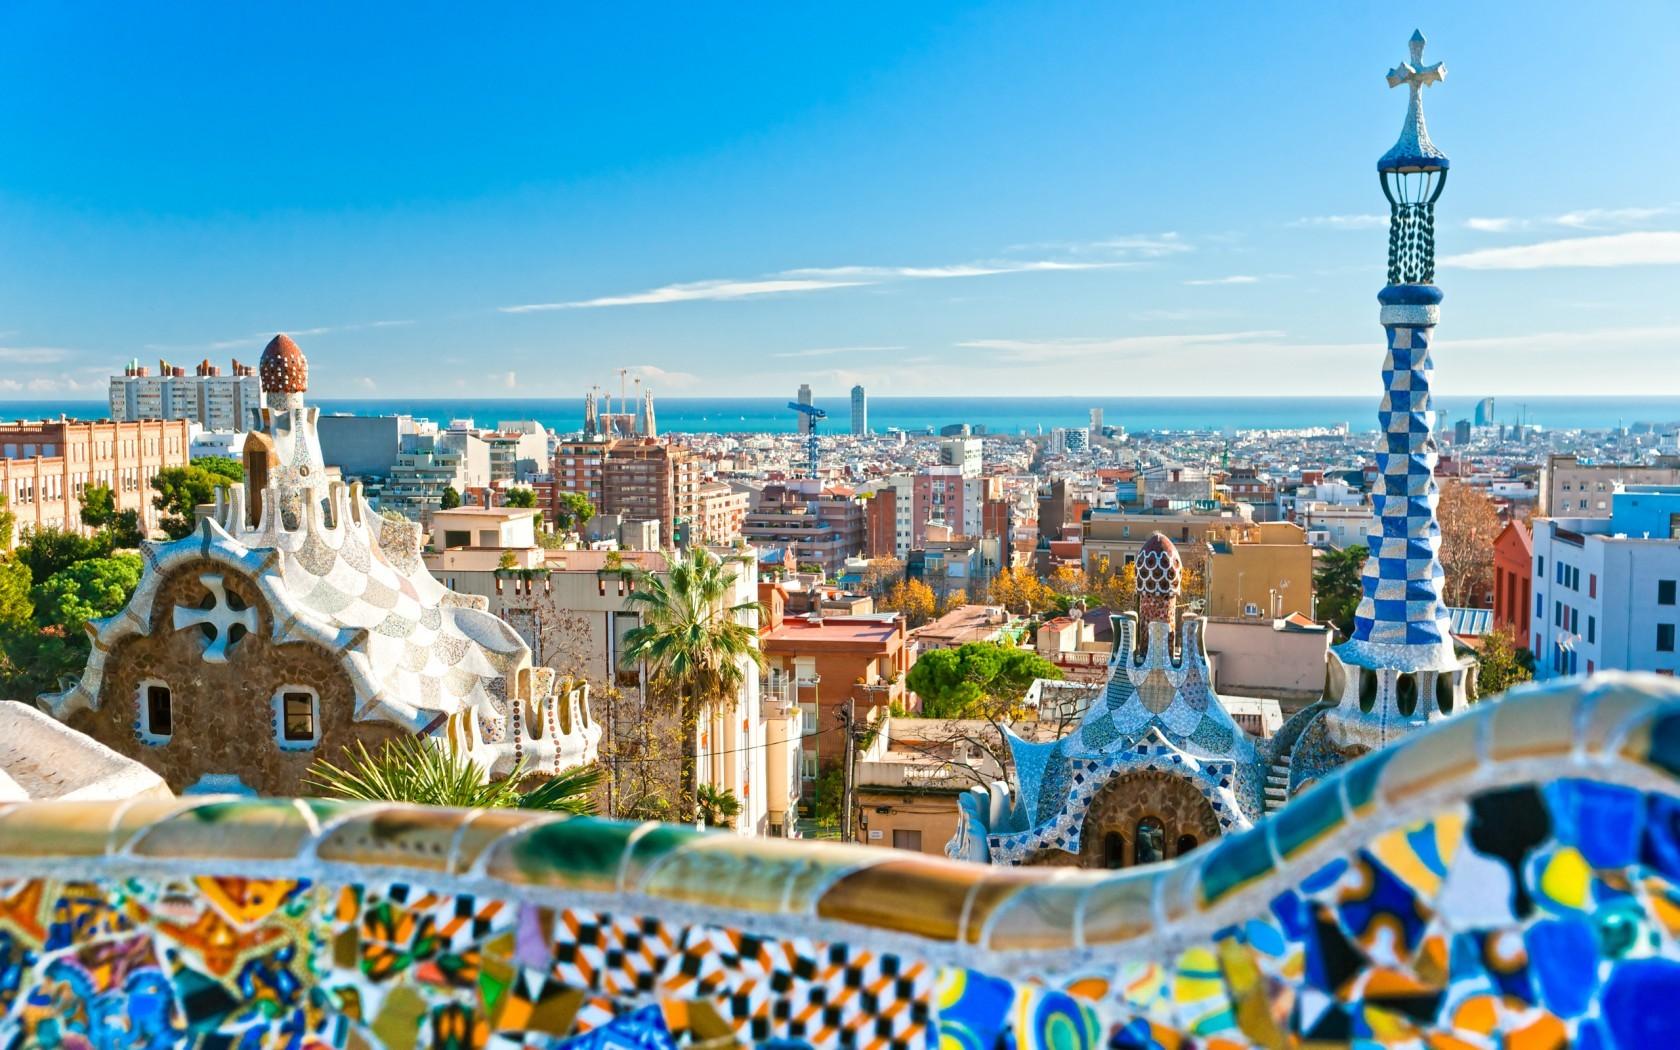 Europe Spain cities gaudi wallpaper 1680x1050 62678 WallpaperUP 1680x1050